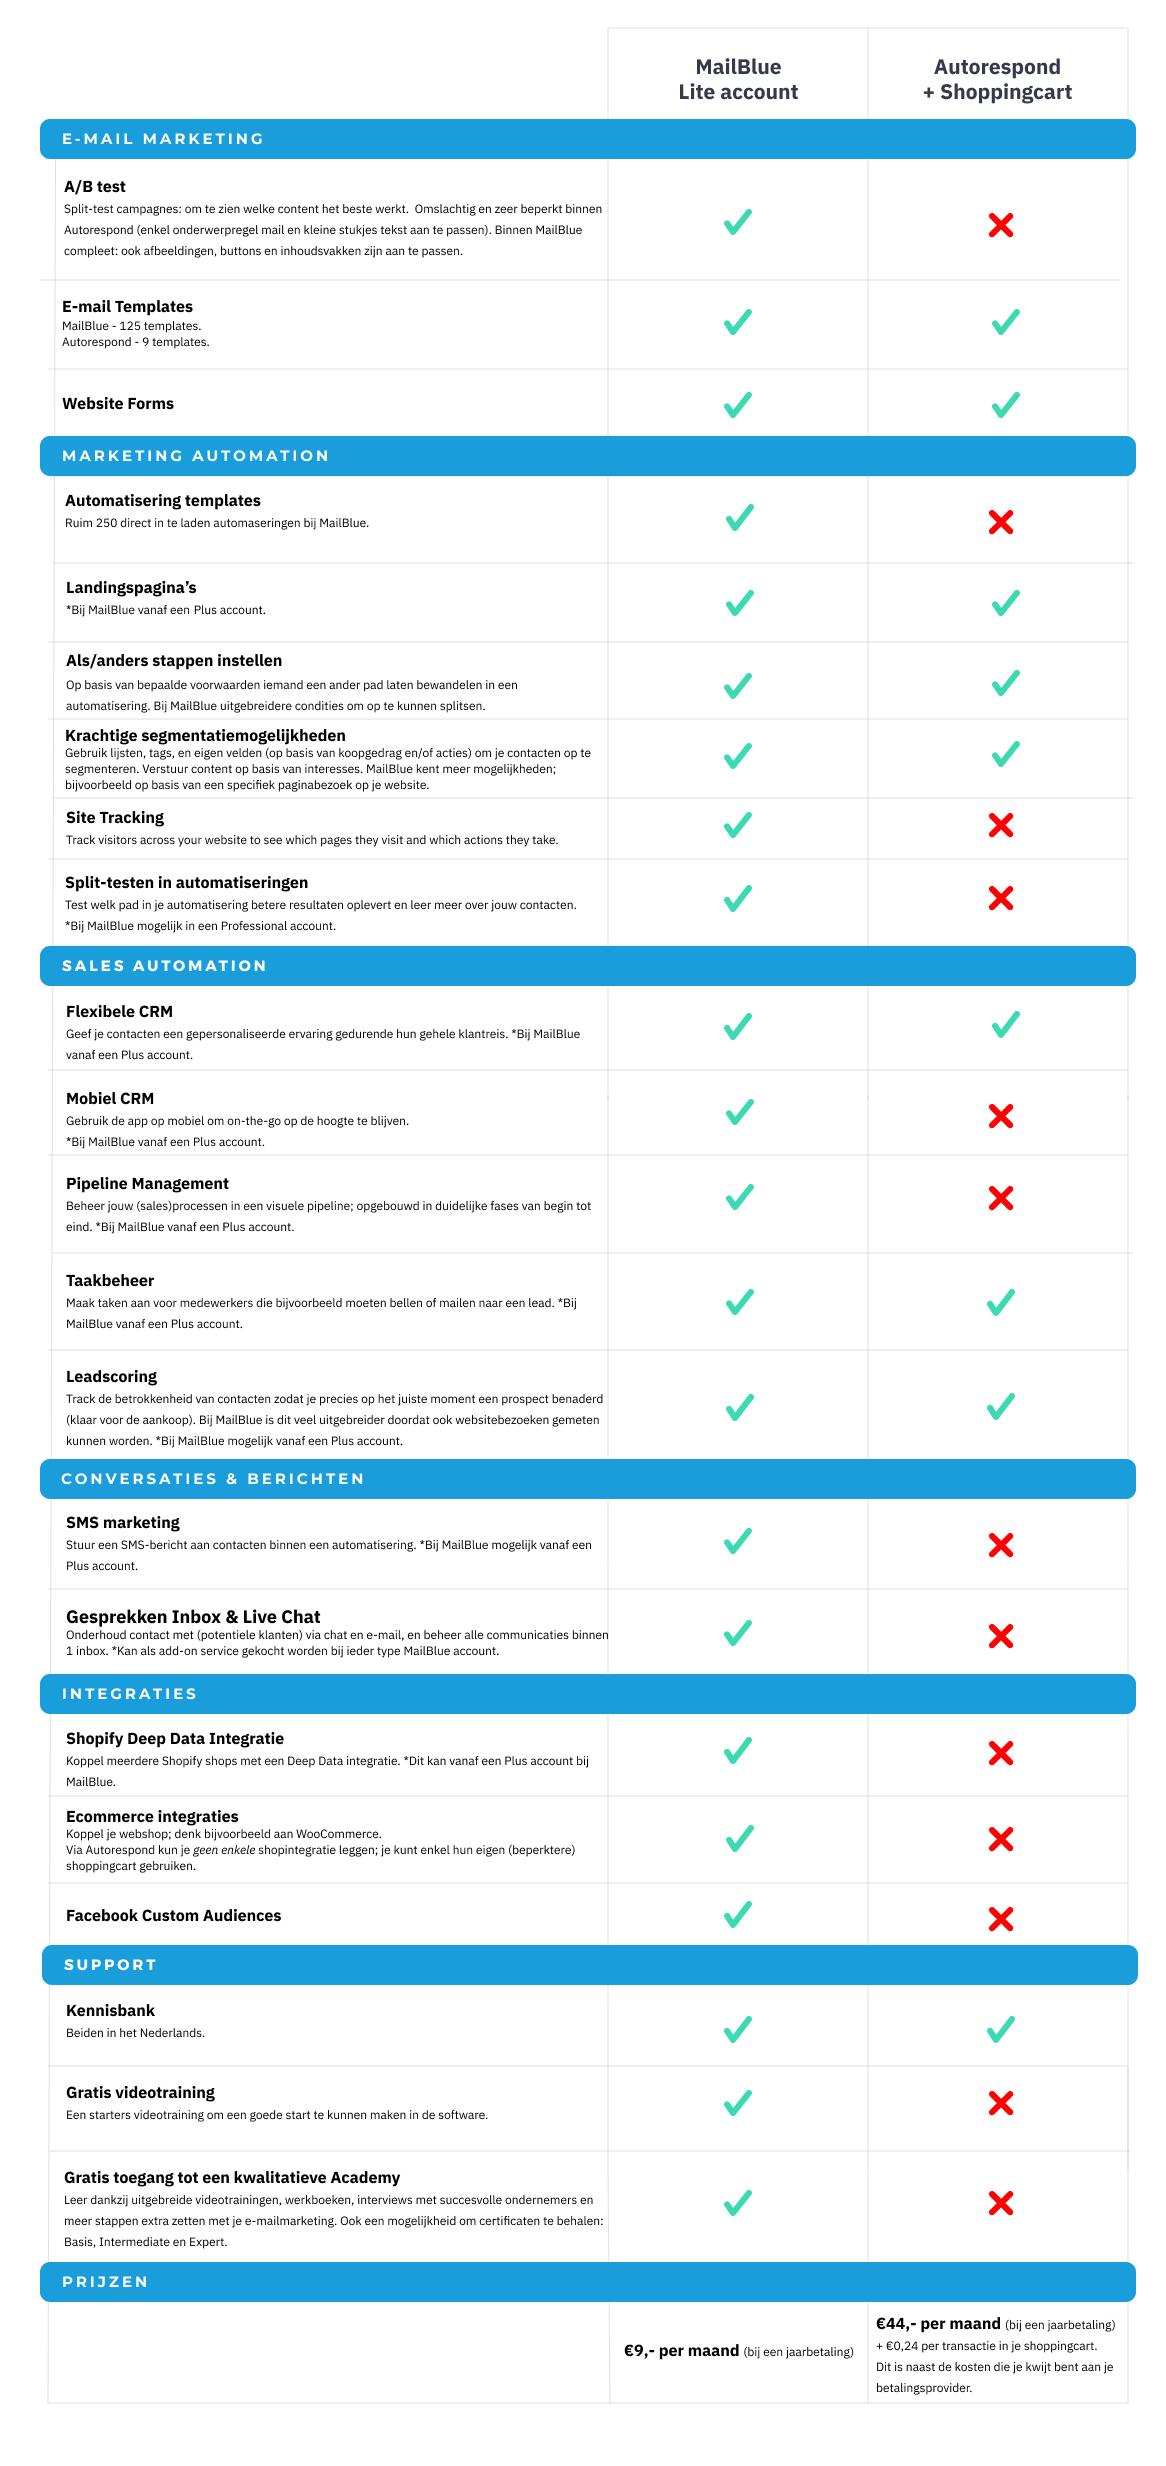 mailblue-vs-autorespond